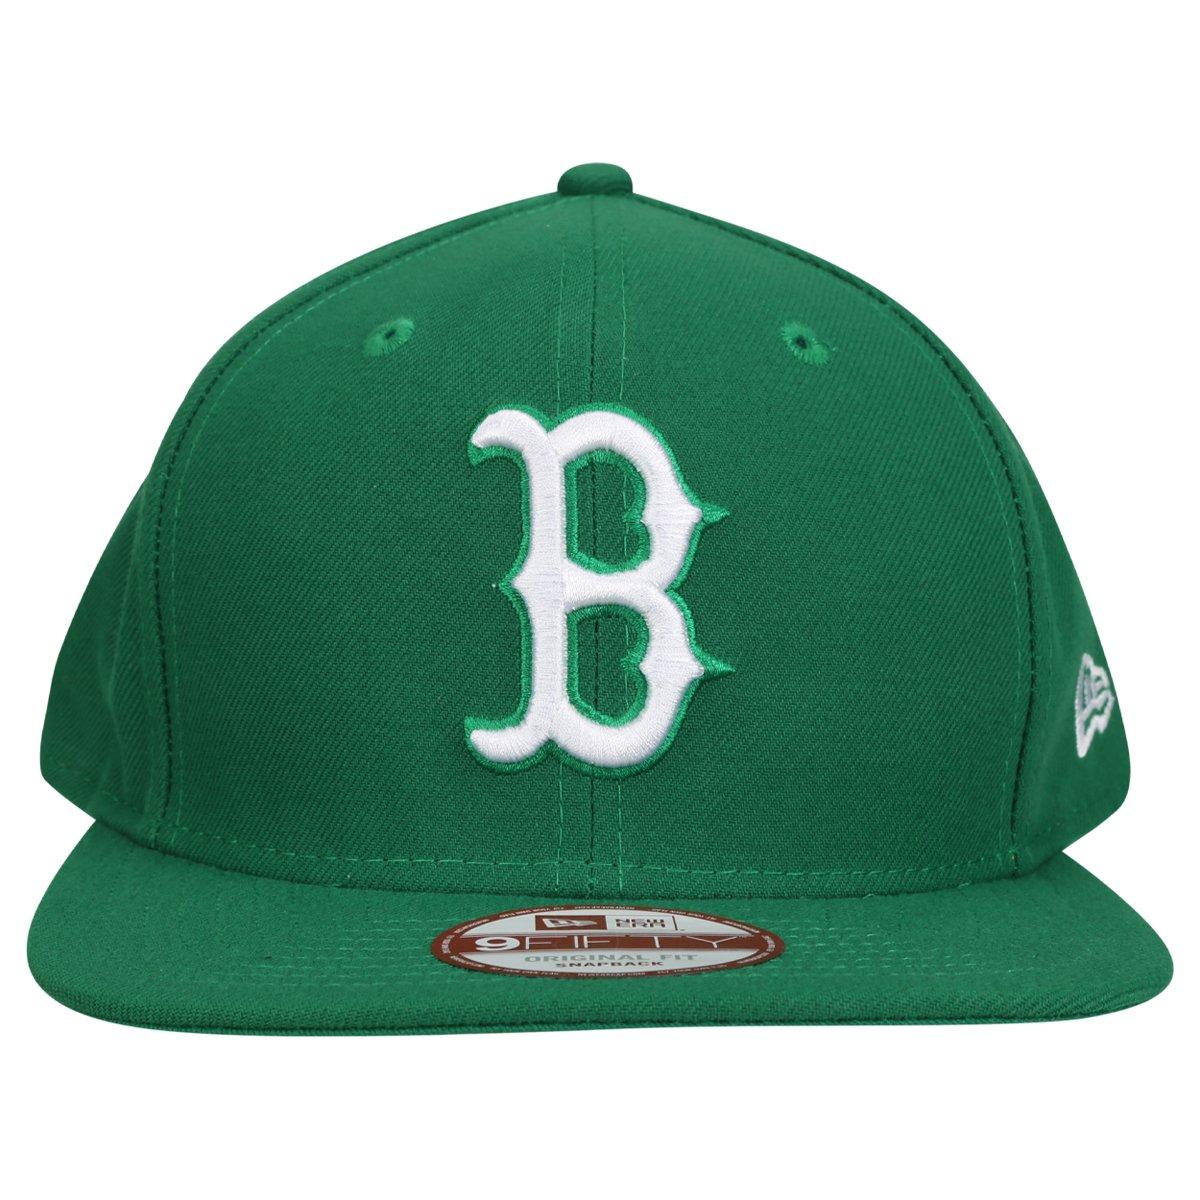 16ec96ee8f2a4 Boné New Era 950 MLB Original Fit Boston Red Sox - Verde água - Compre  Agora